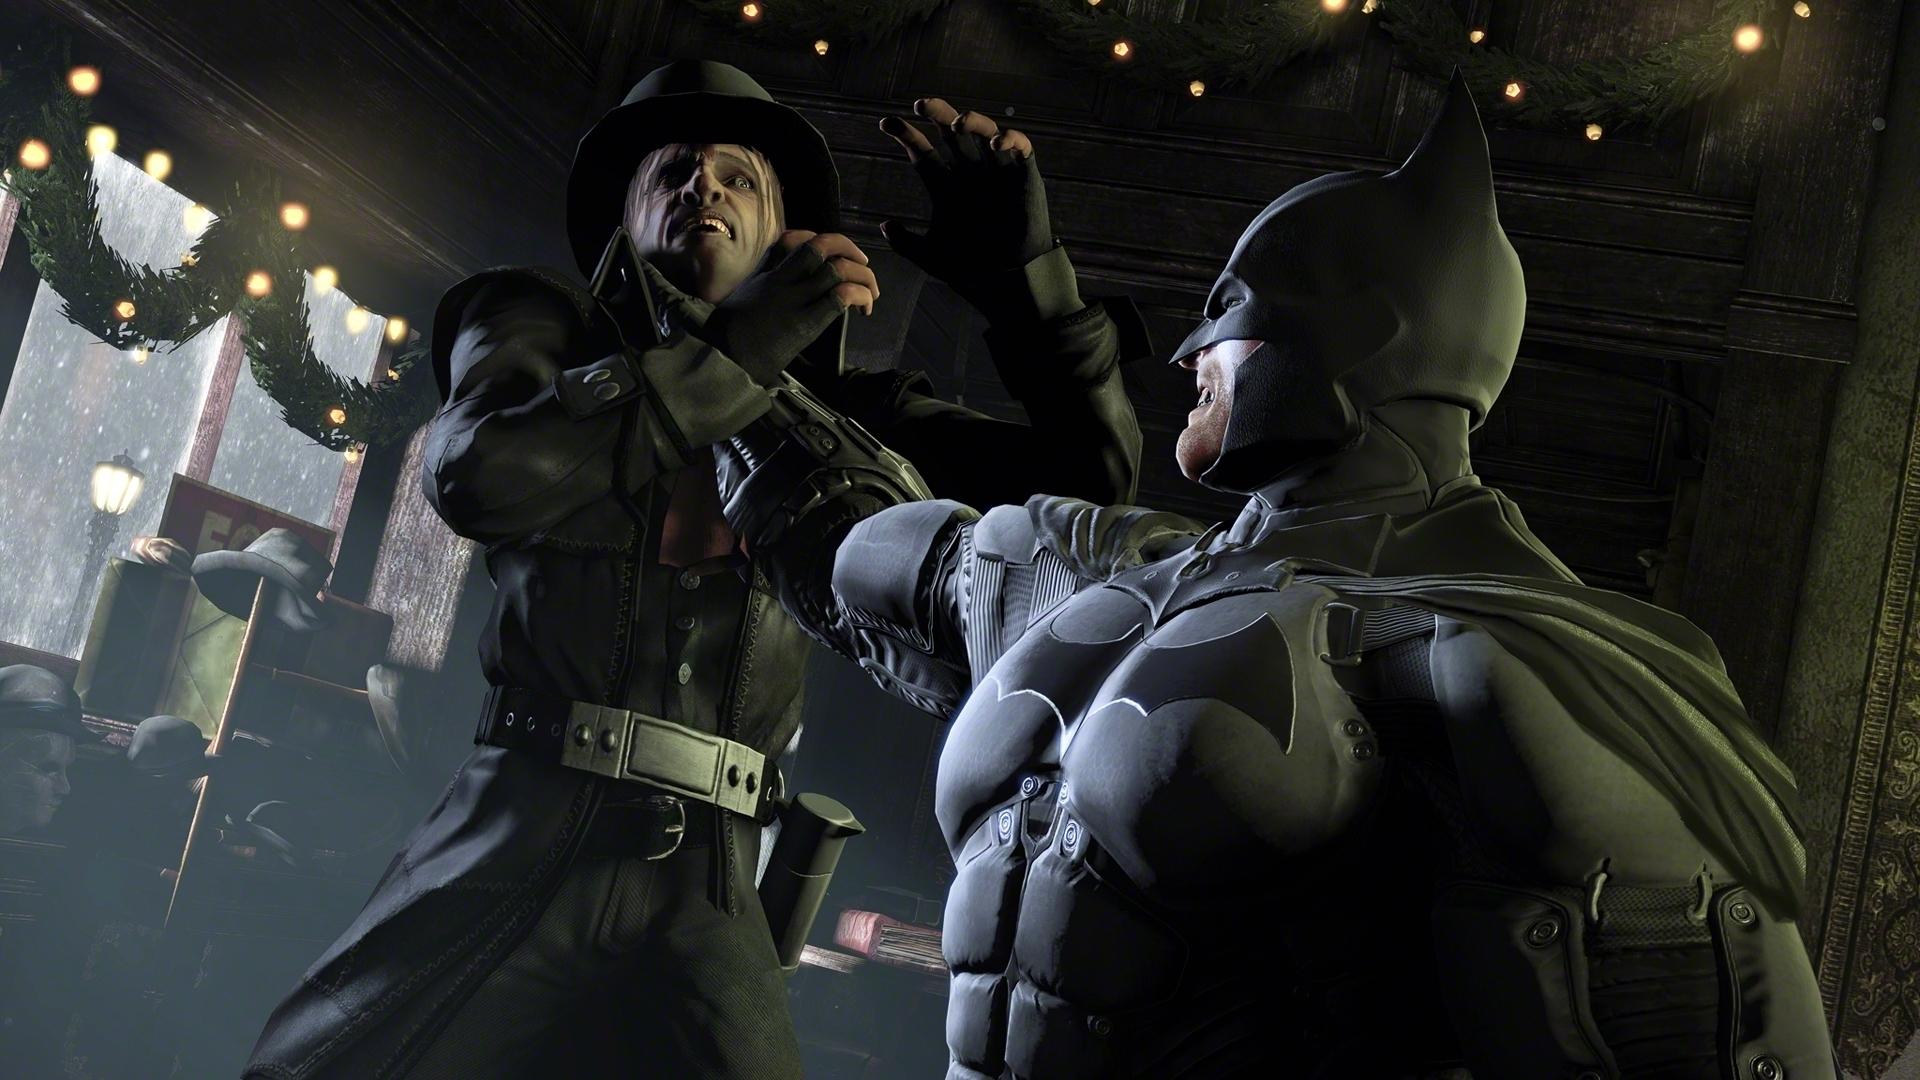 Batman Arkham Origins Wallpaper: Page 11 Of Batman Wallpapers, Photos And Desktop Backgrounds